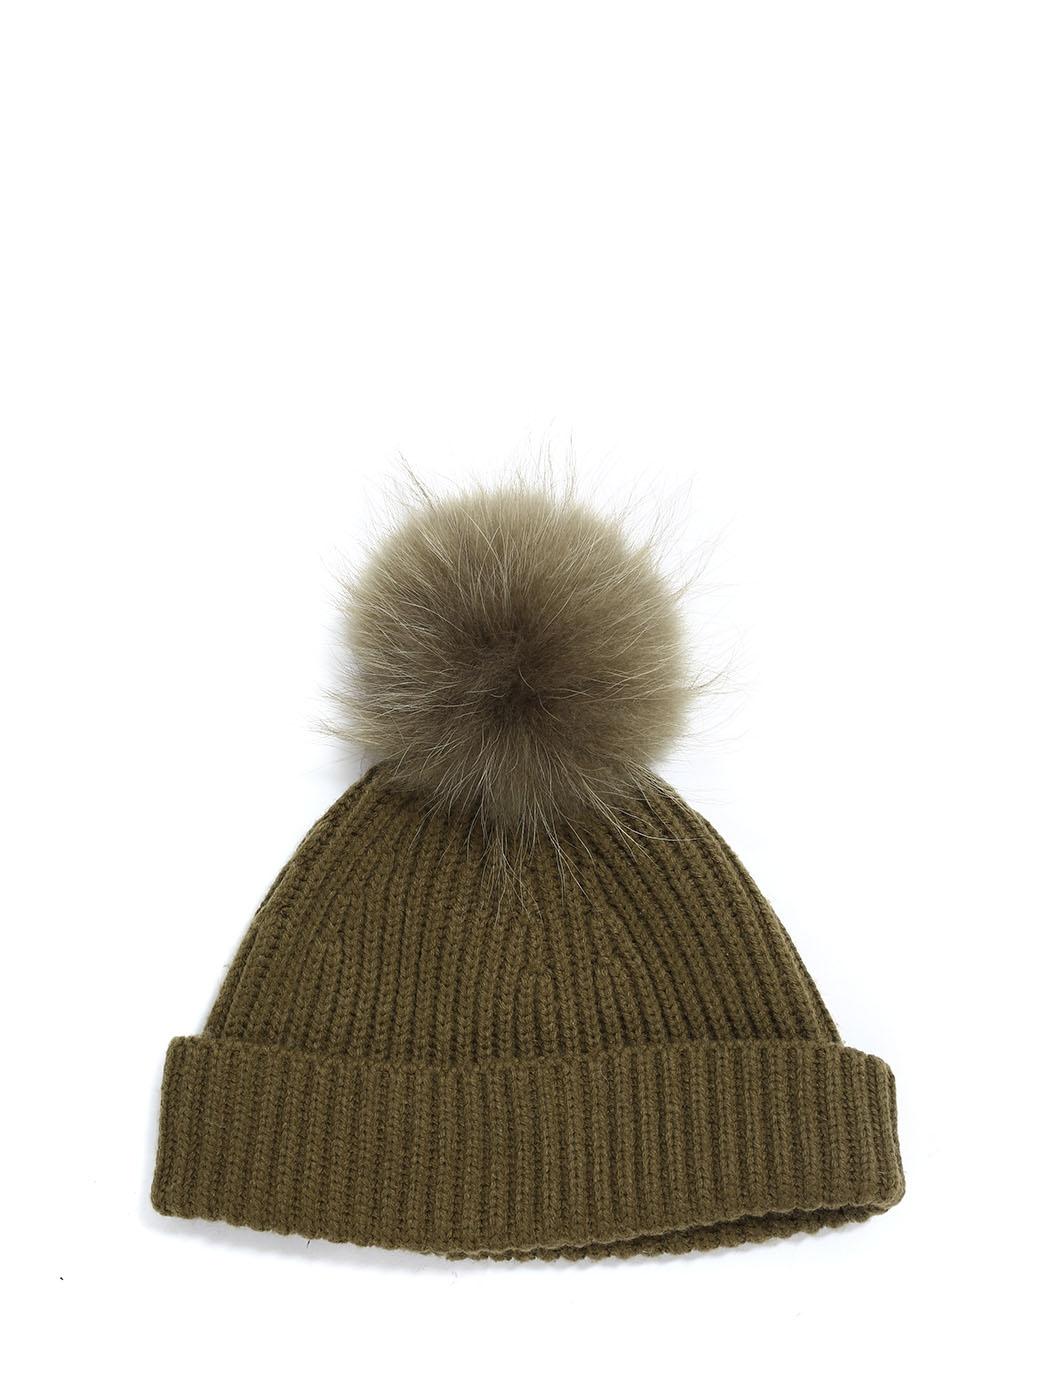 Wool-blend Knit Beanie with Faux Fur Pompom Black Knit Beanie The Mara Beanie  Women/'s Knit Hat